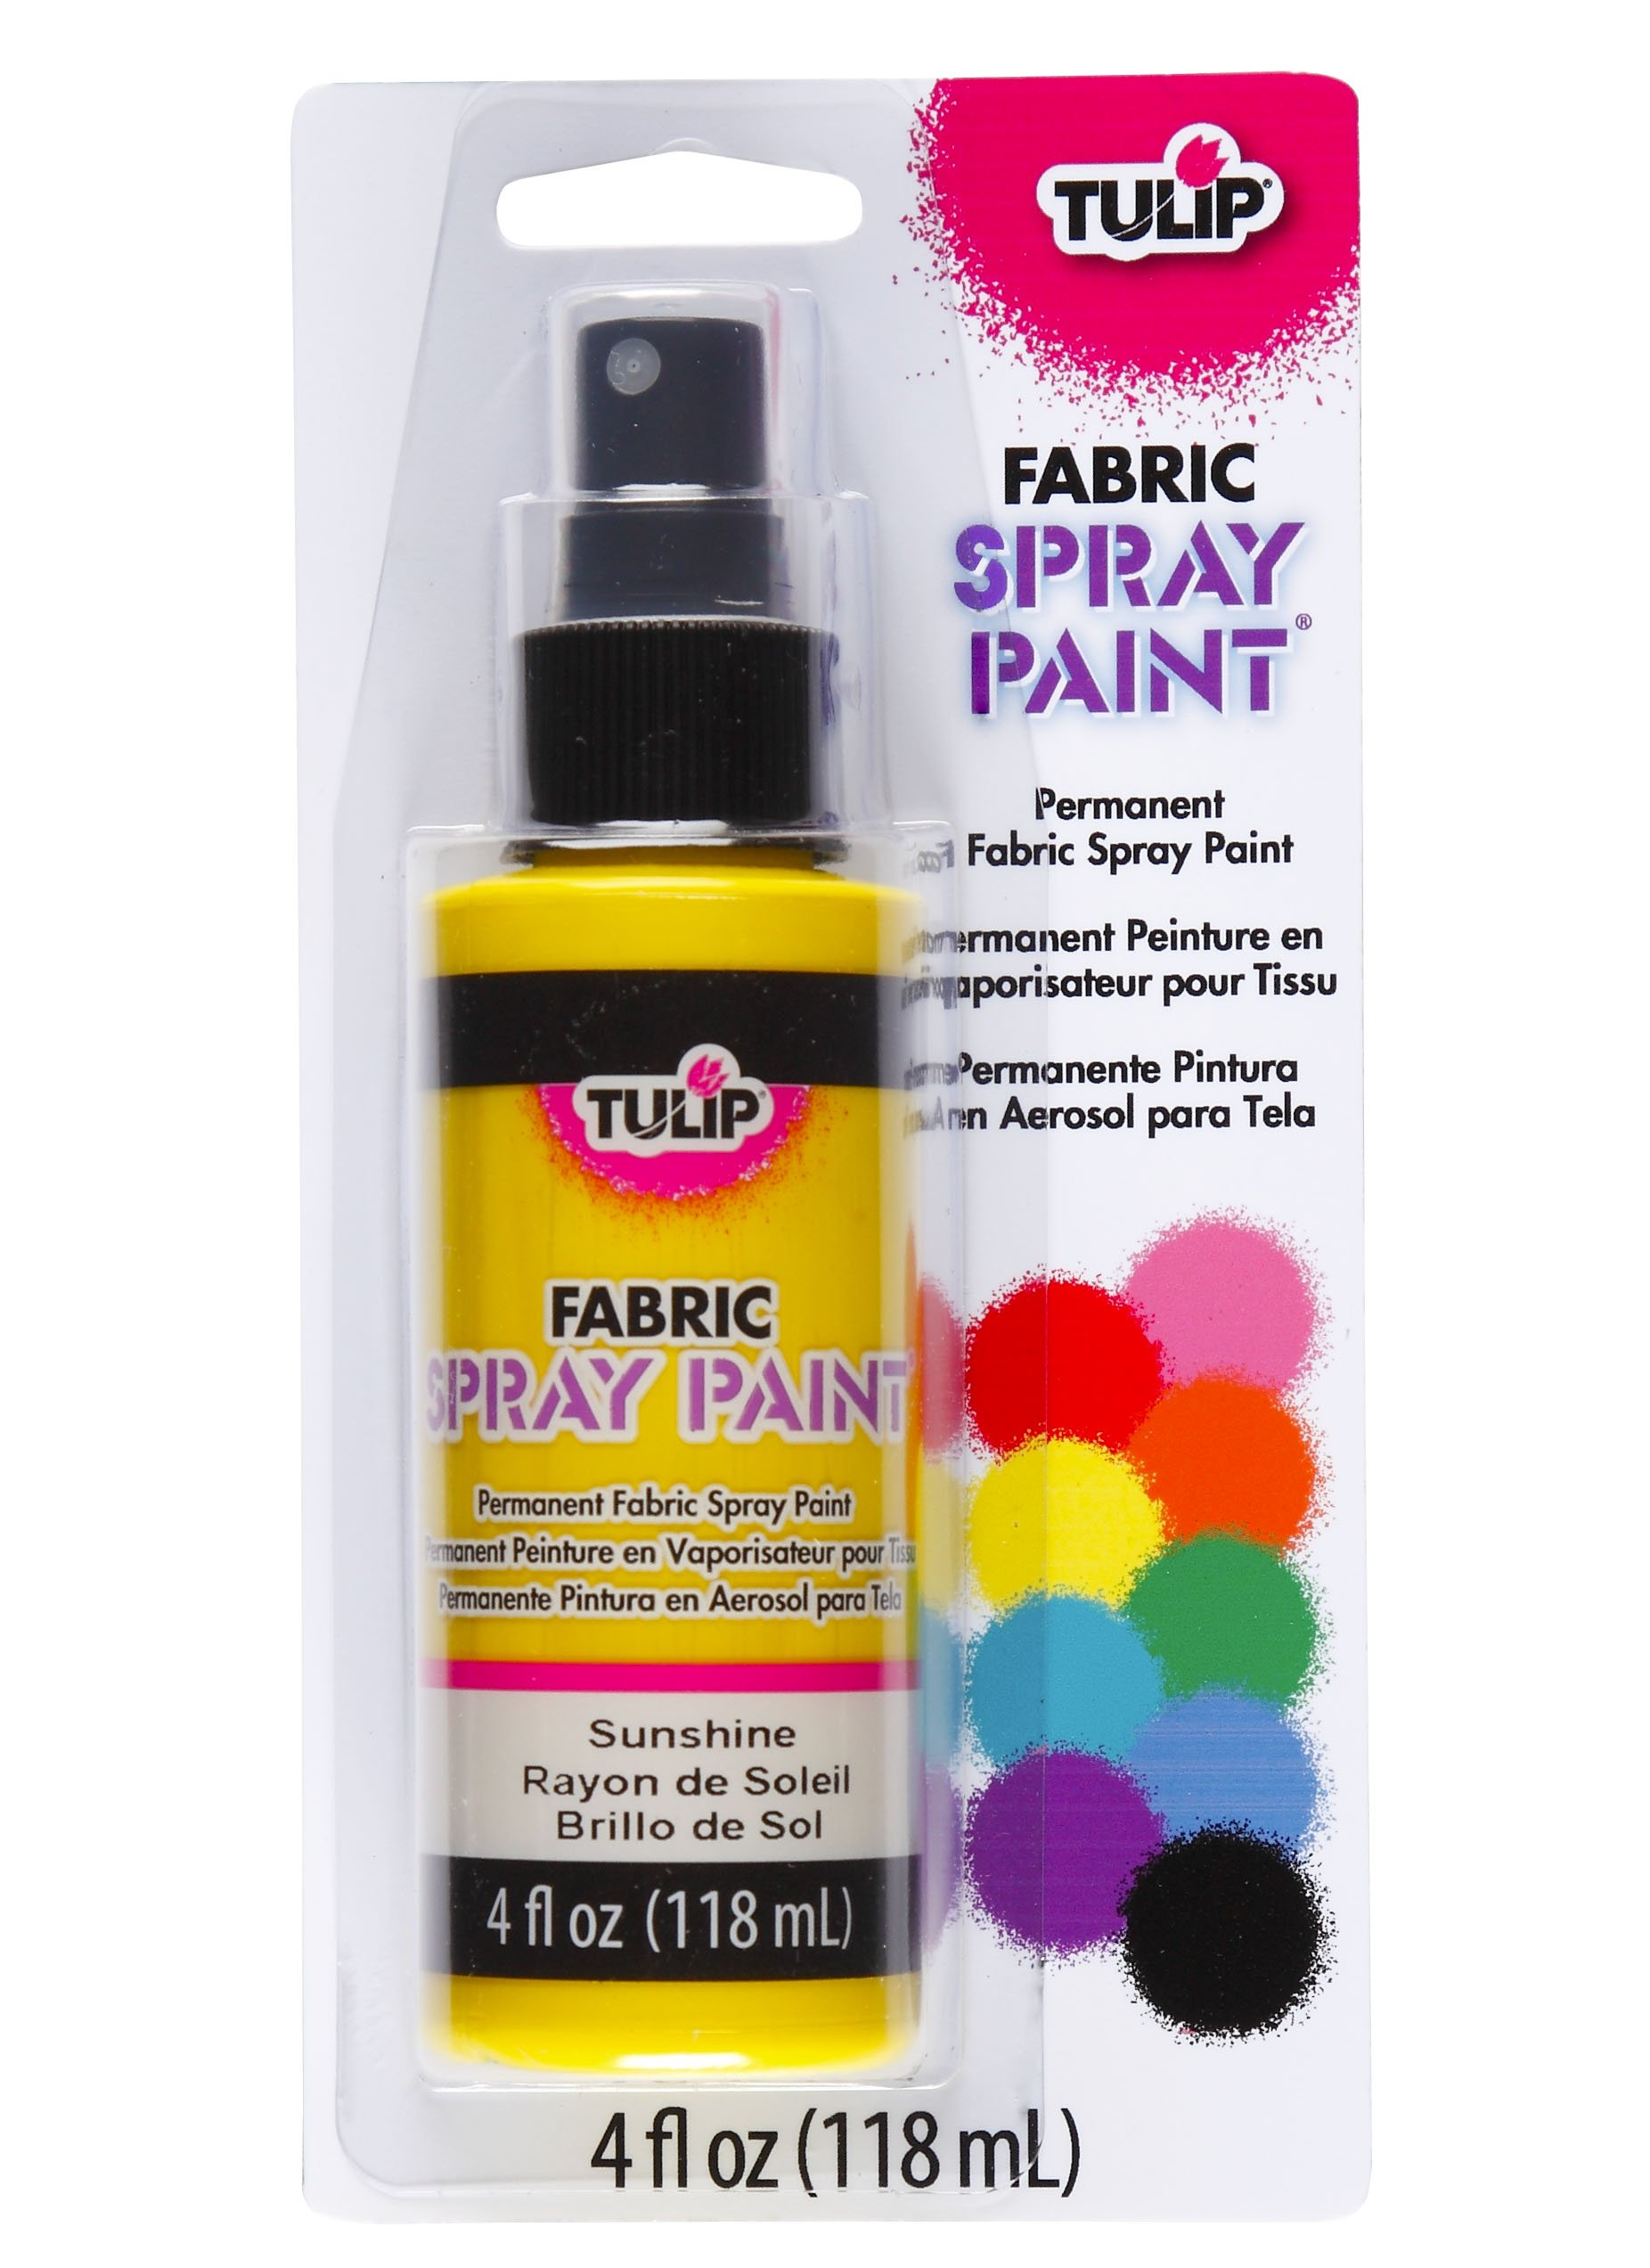 Heat Resist Spray Paint Does It Work